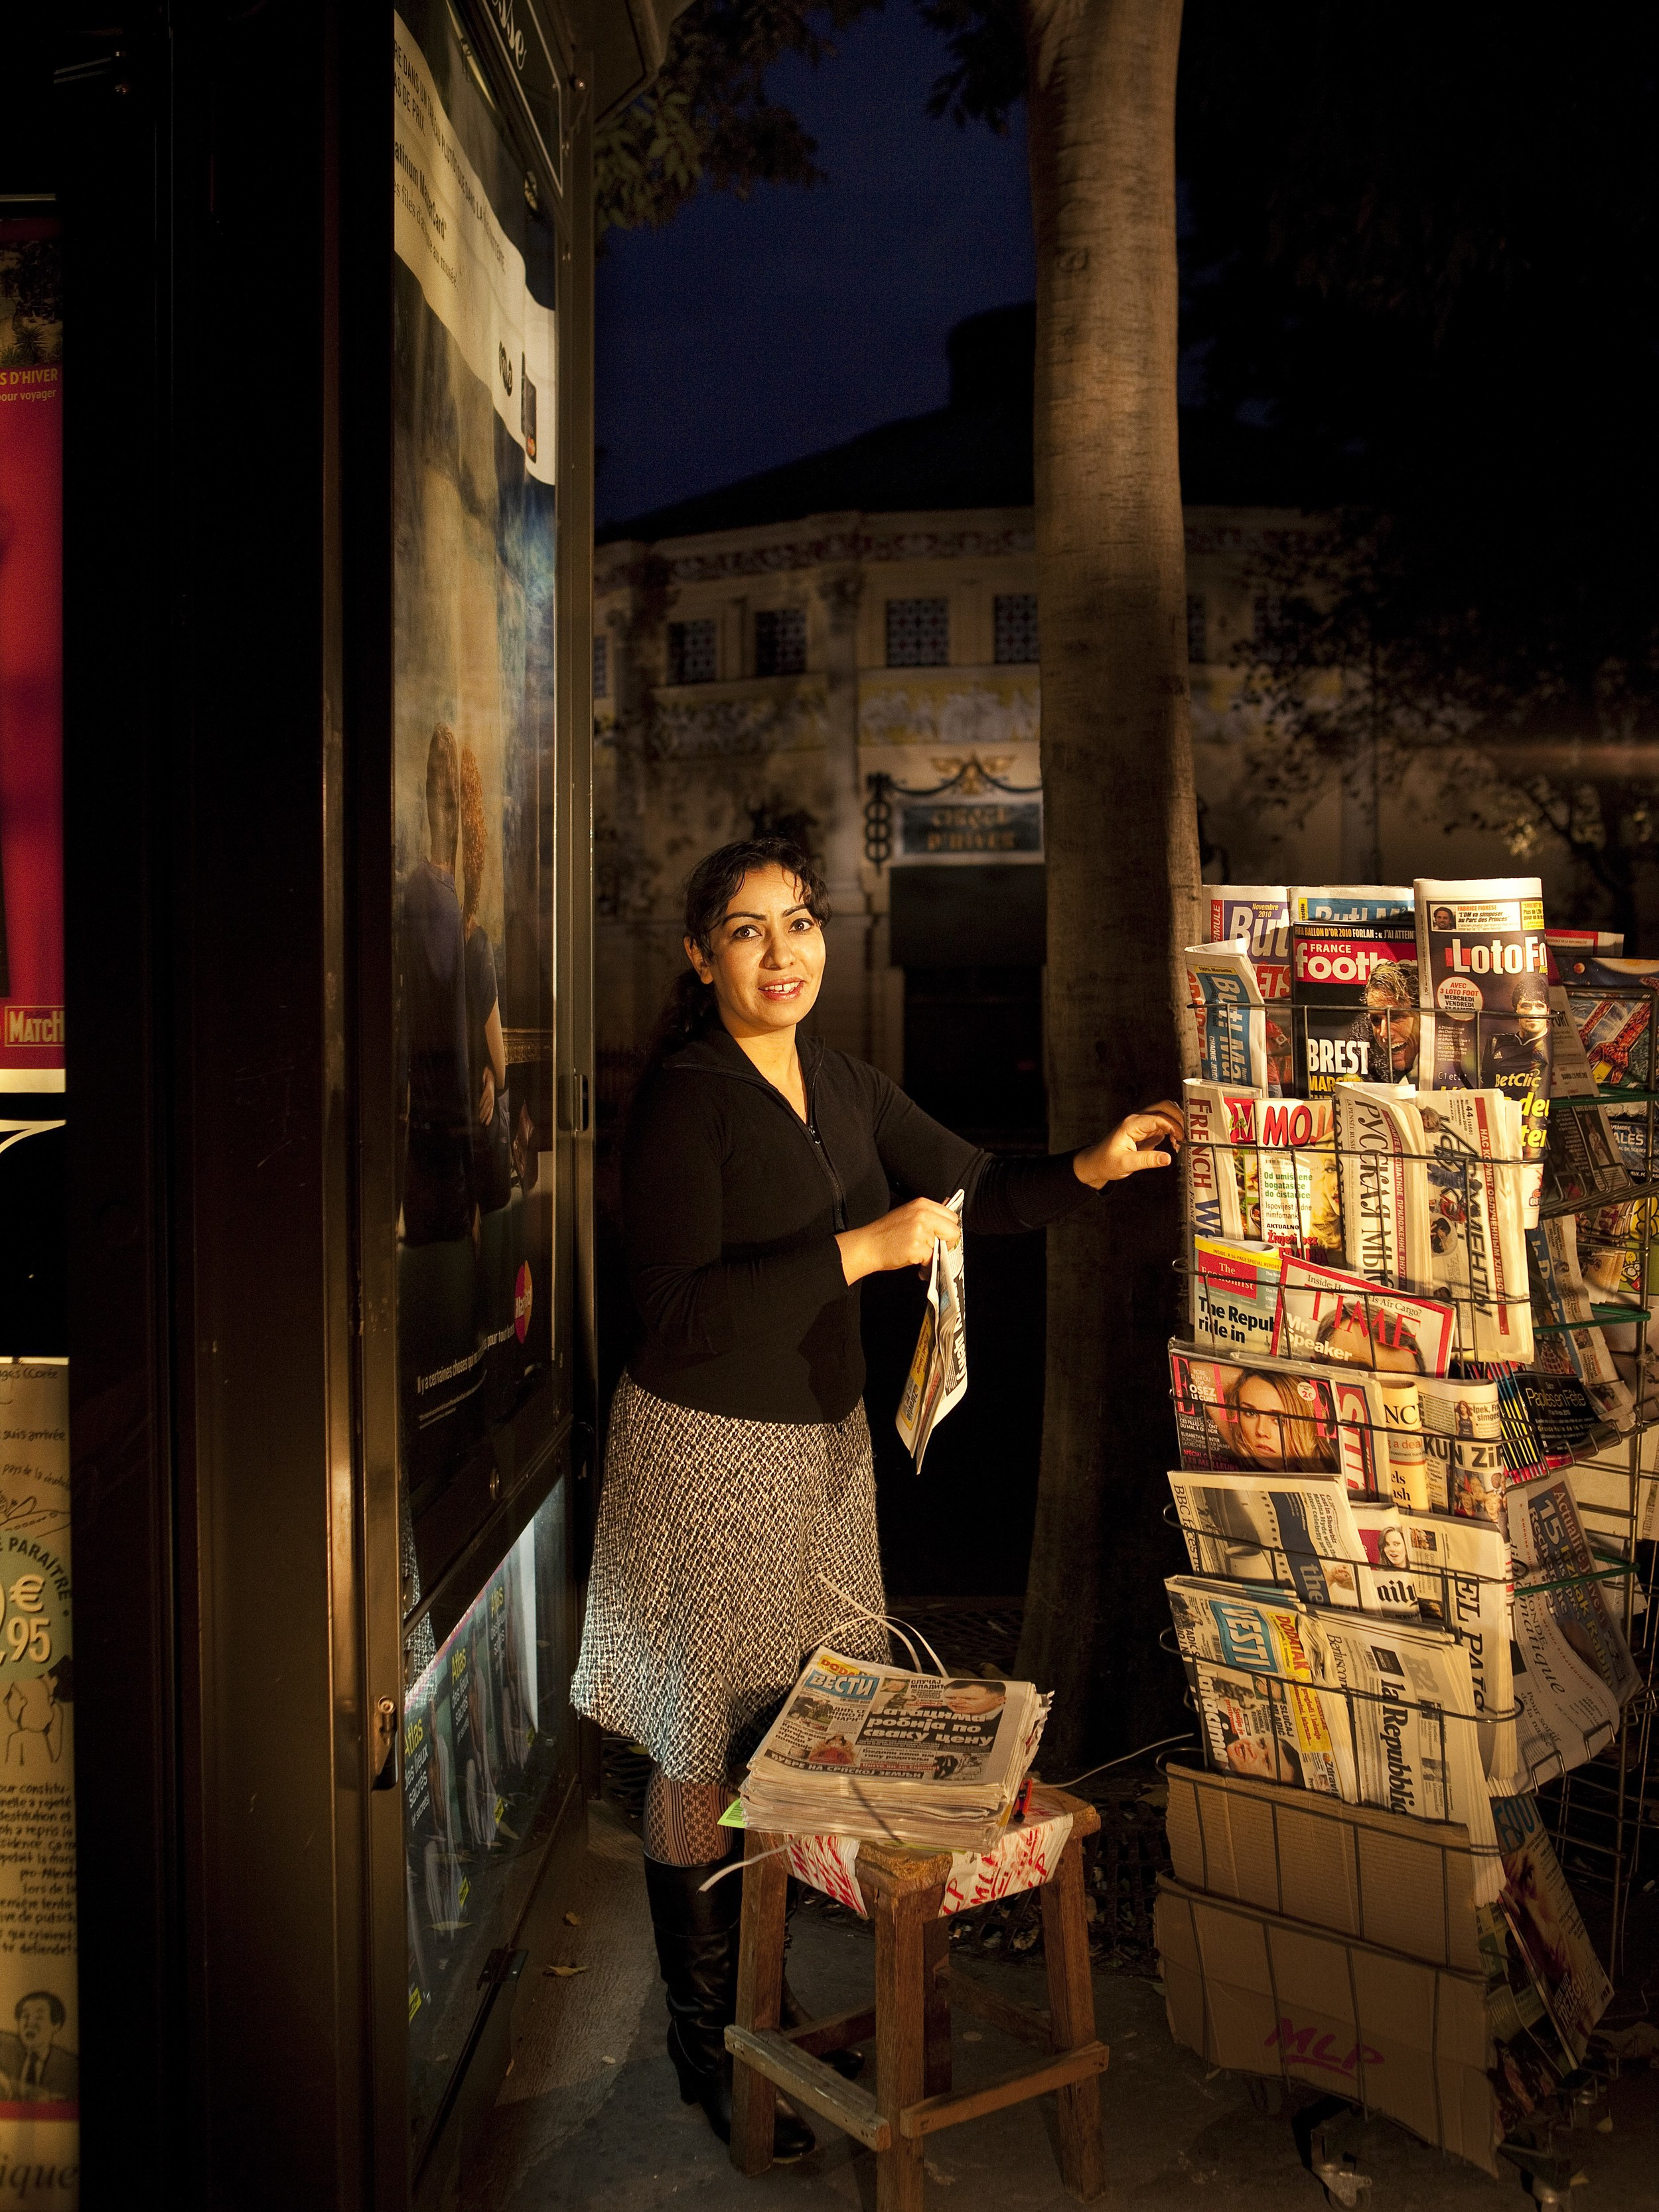 Kiosques Paris-80-3.jpg